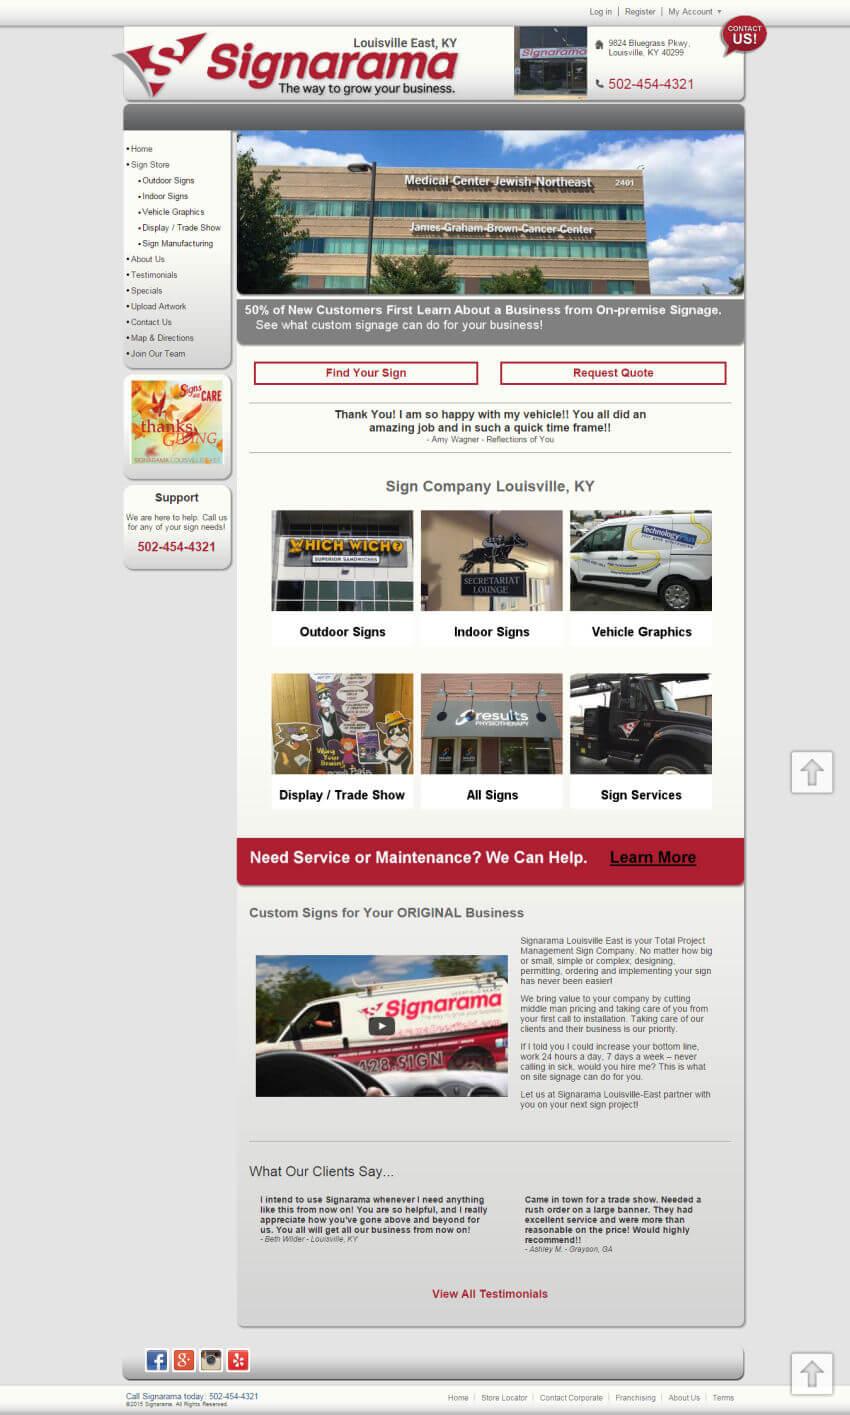 signarama louisville east homepage - after